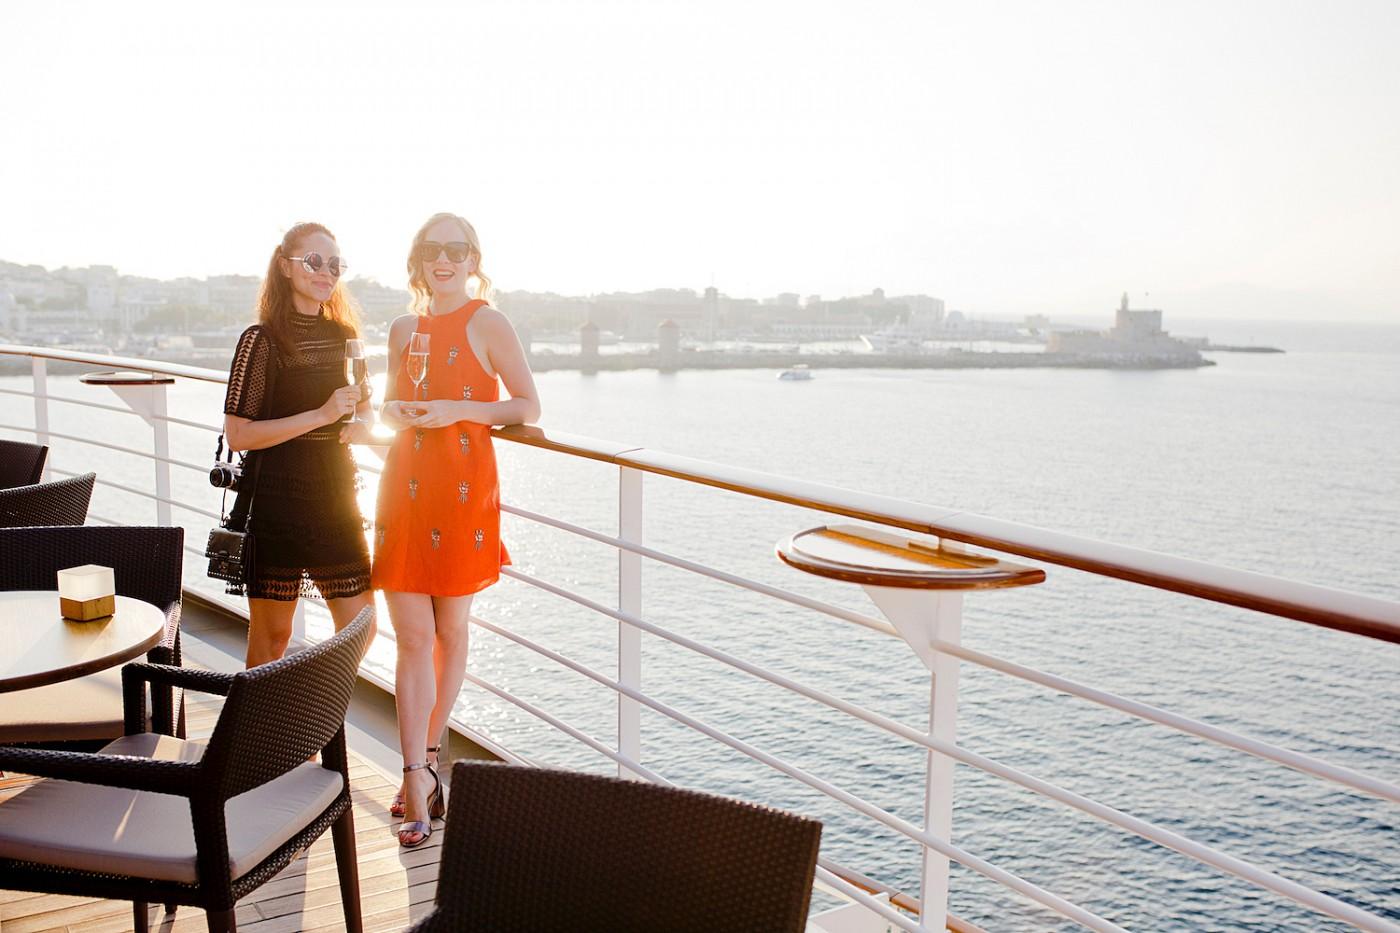 My <em>first</em> Cruise |MS Europa 2